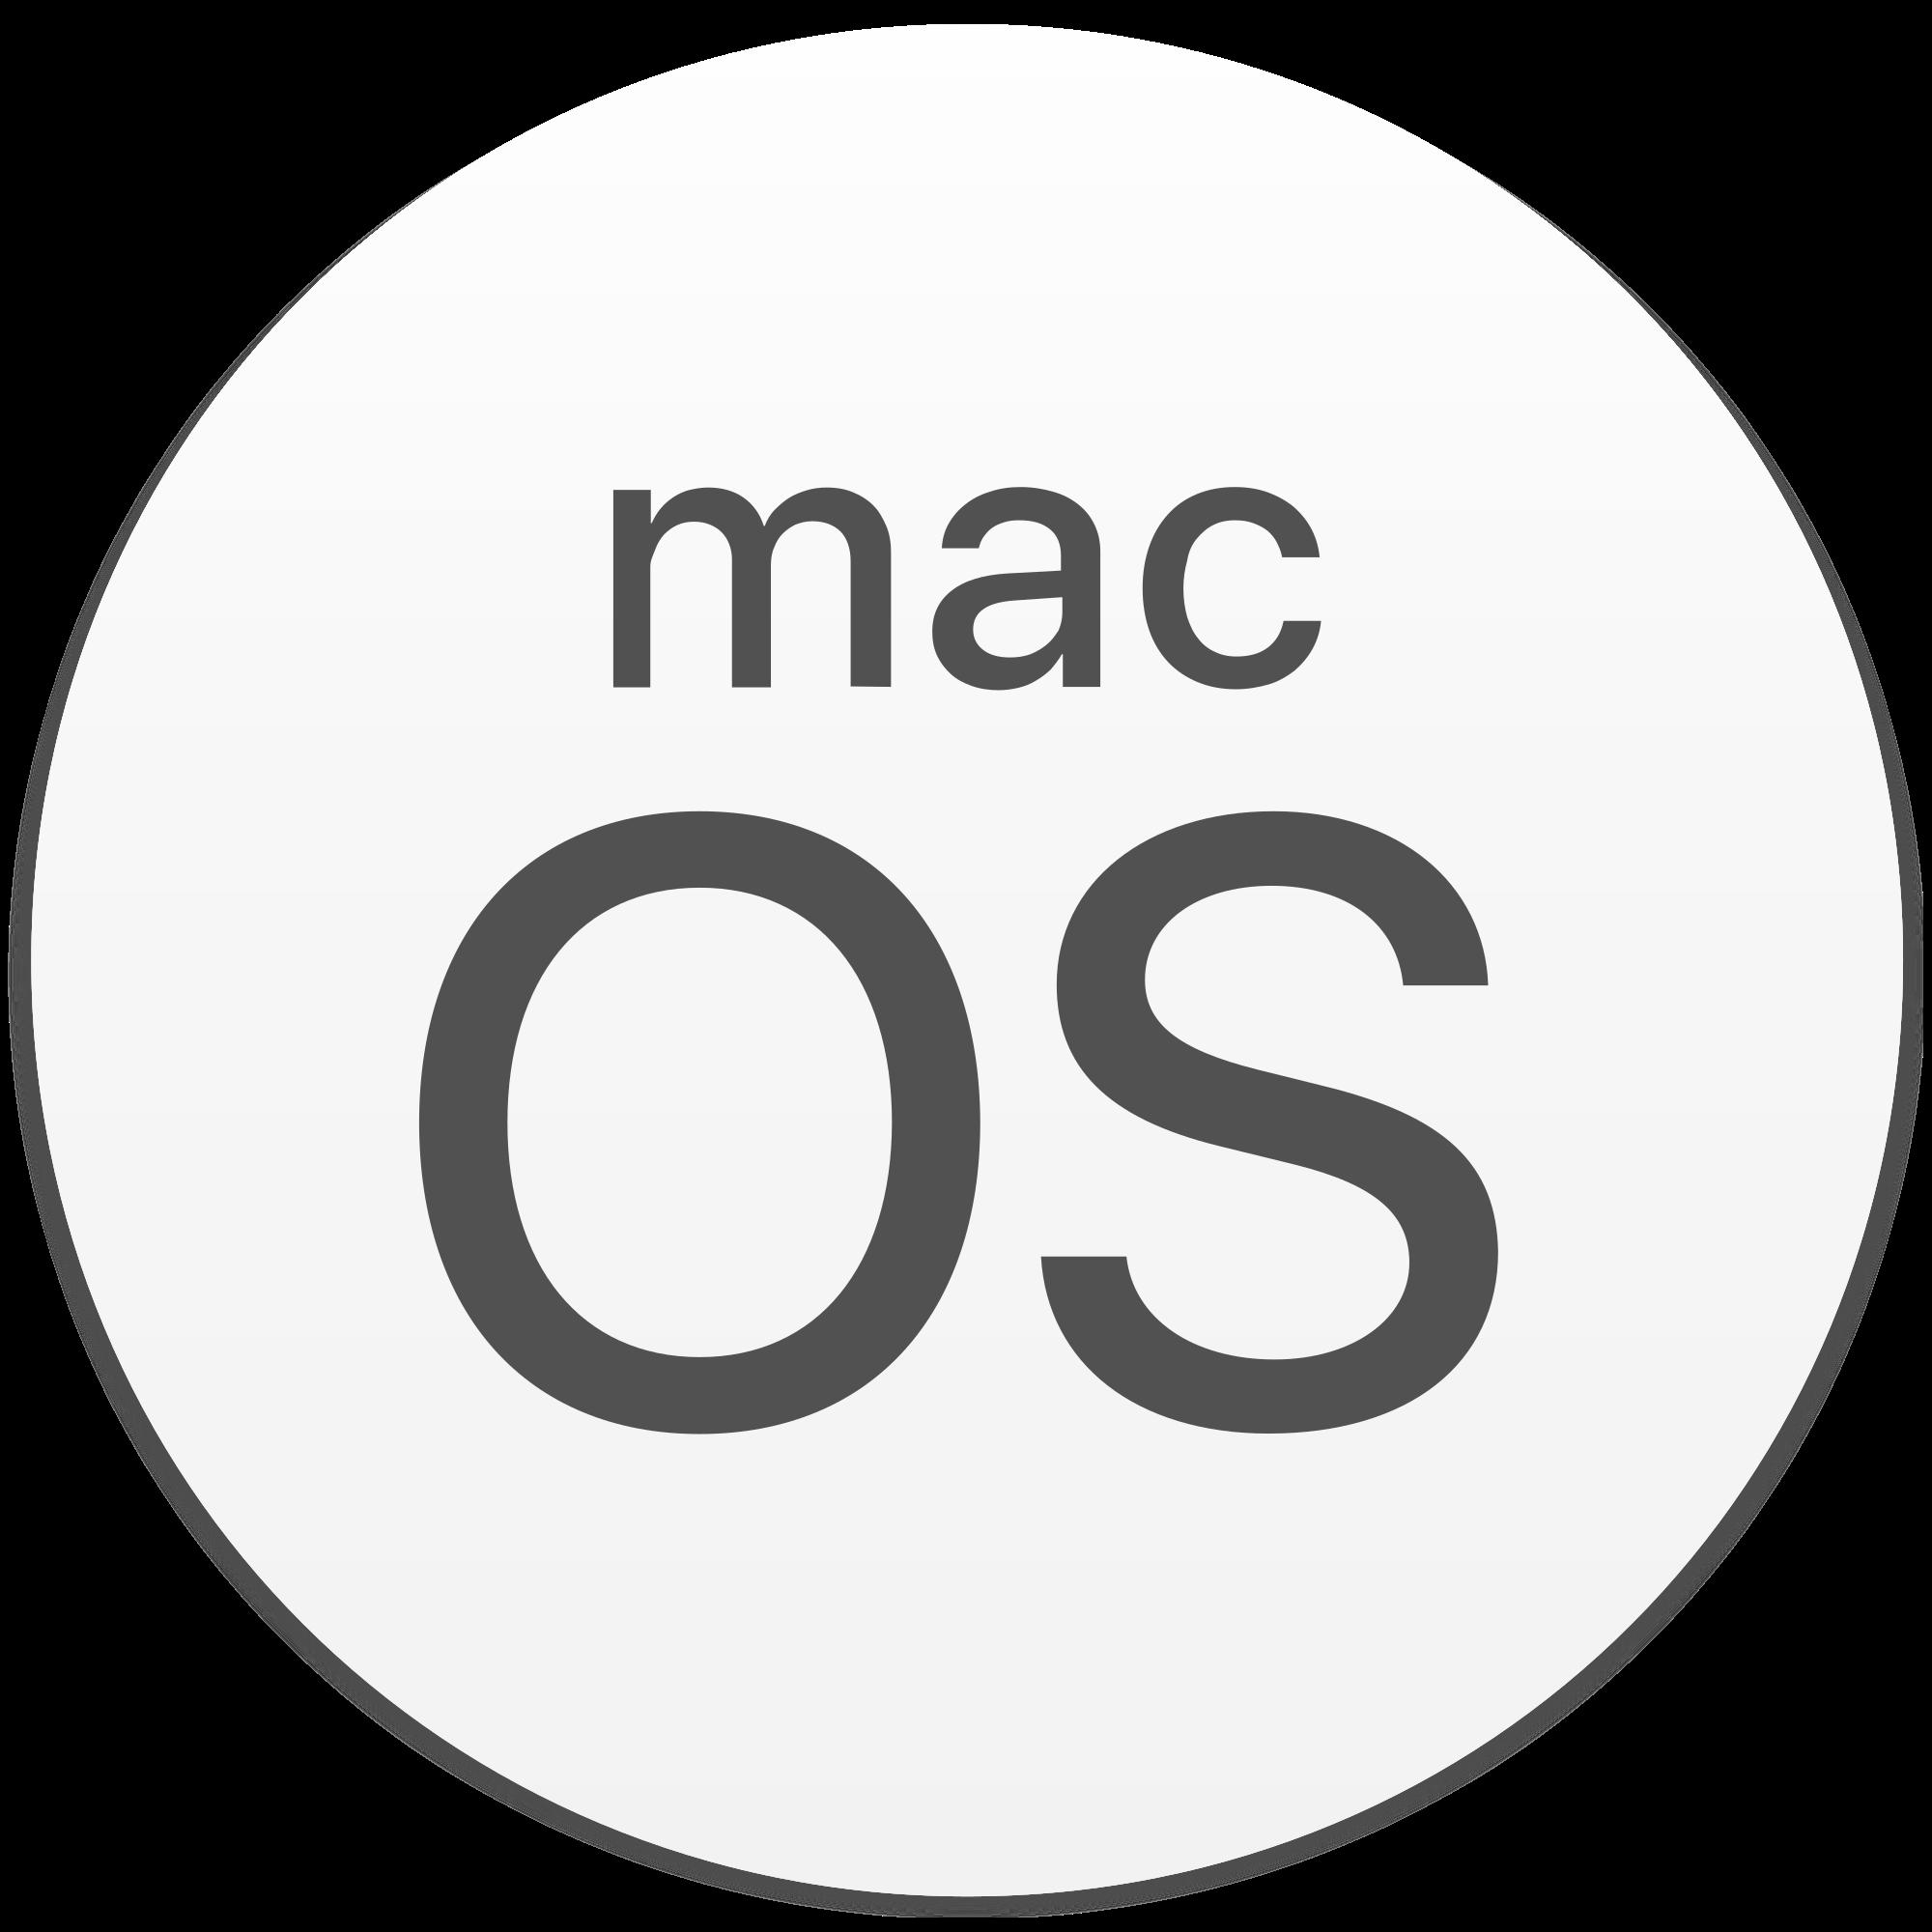 macOS